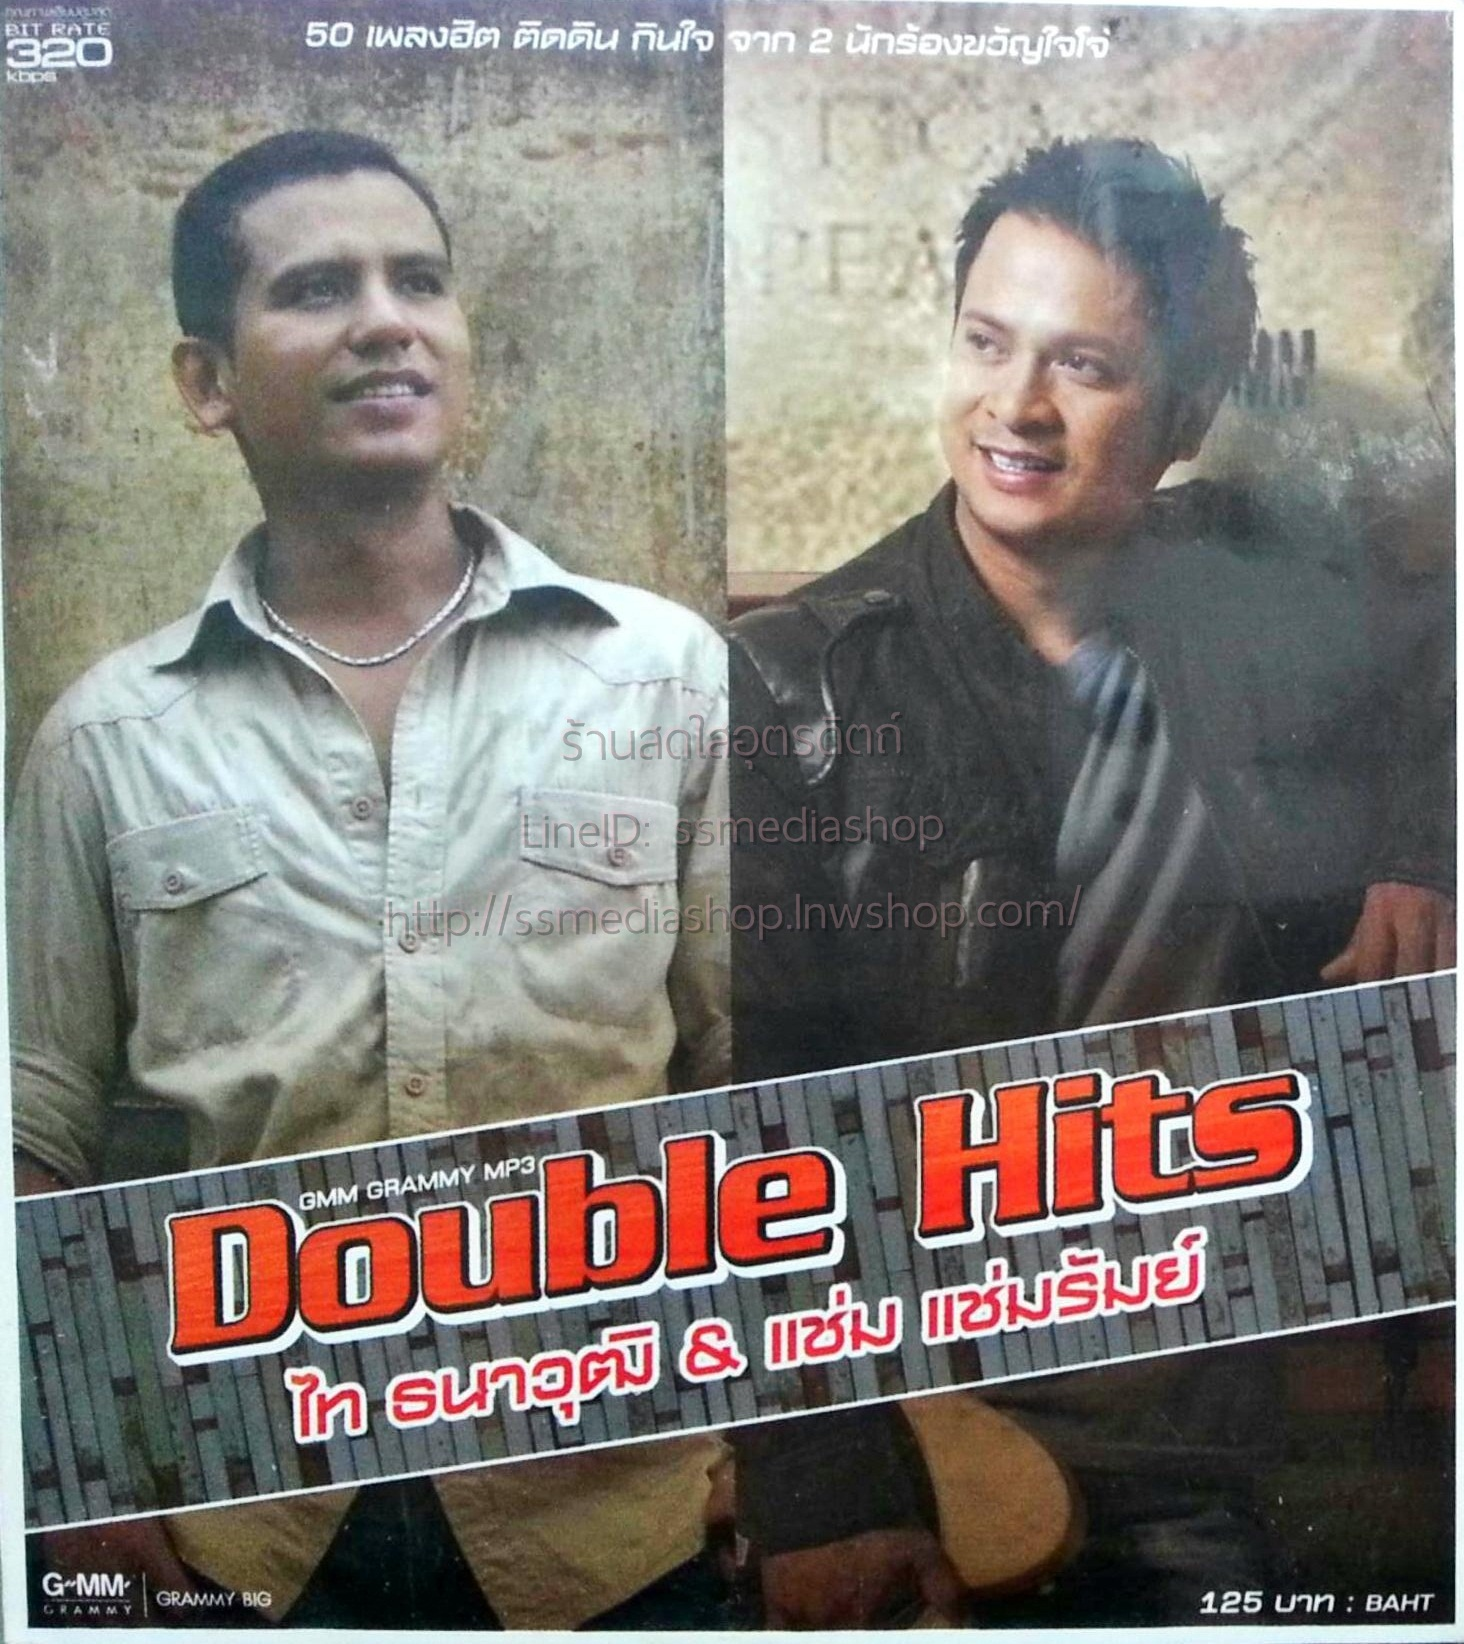 MP3 ไท ธนาวุฒิ+แช่ม แช่มรัมย์ double hits